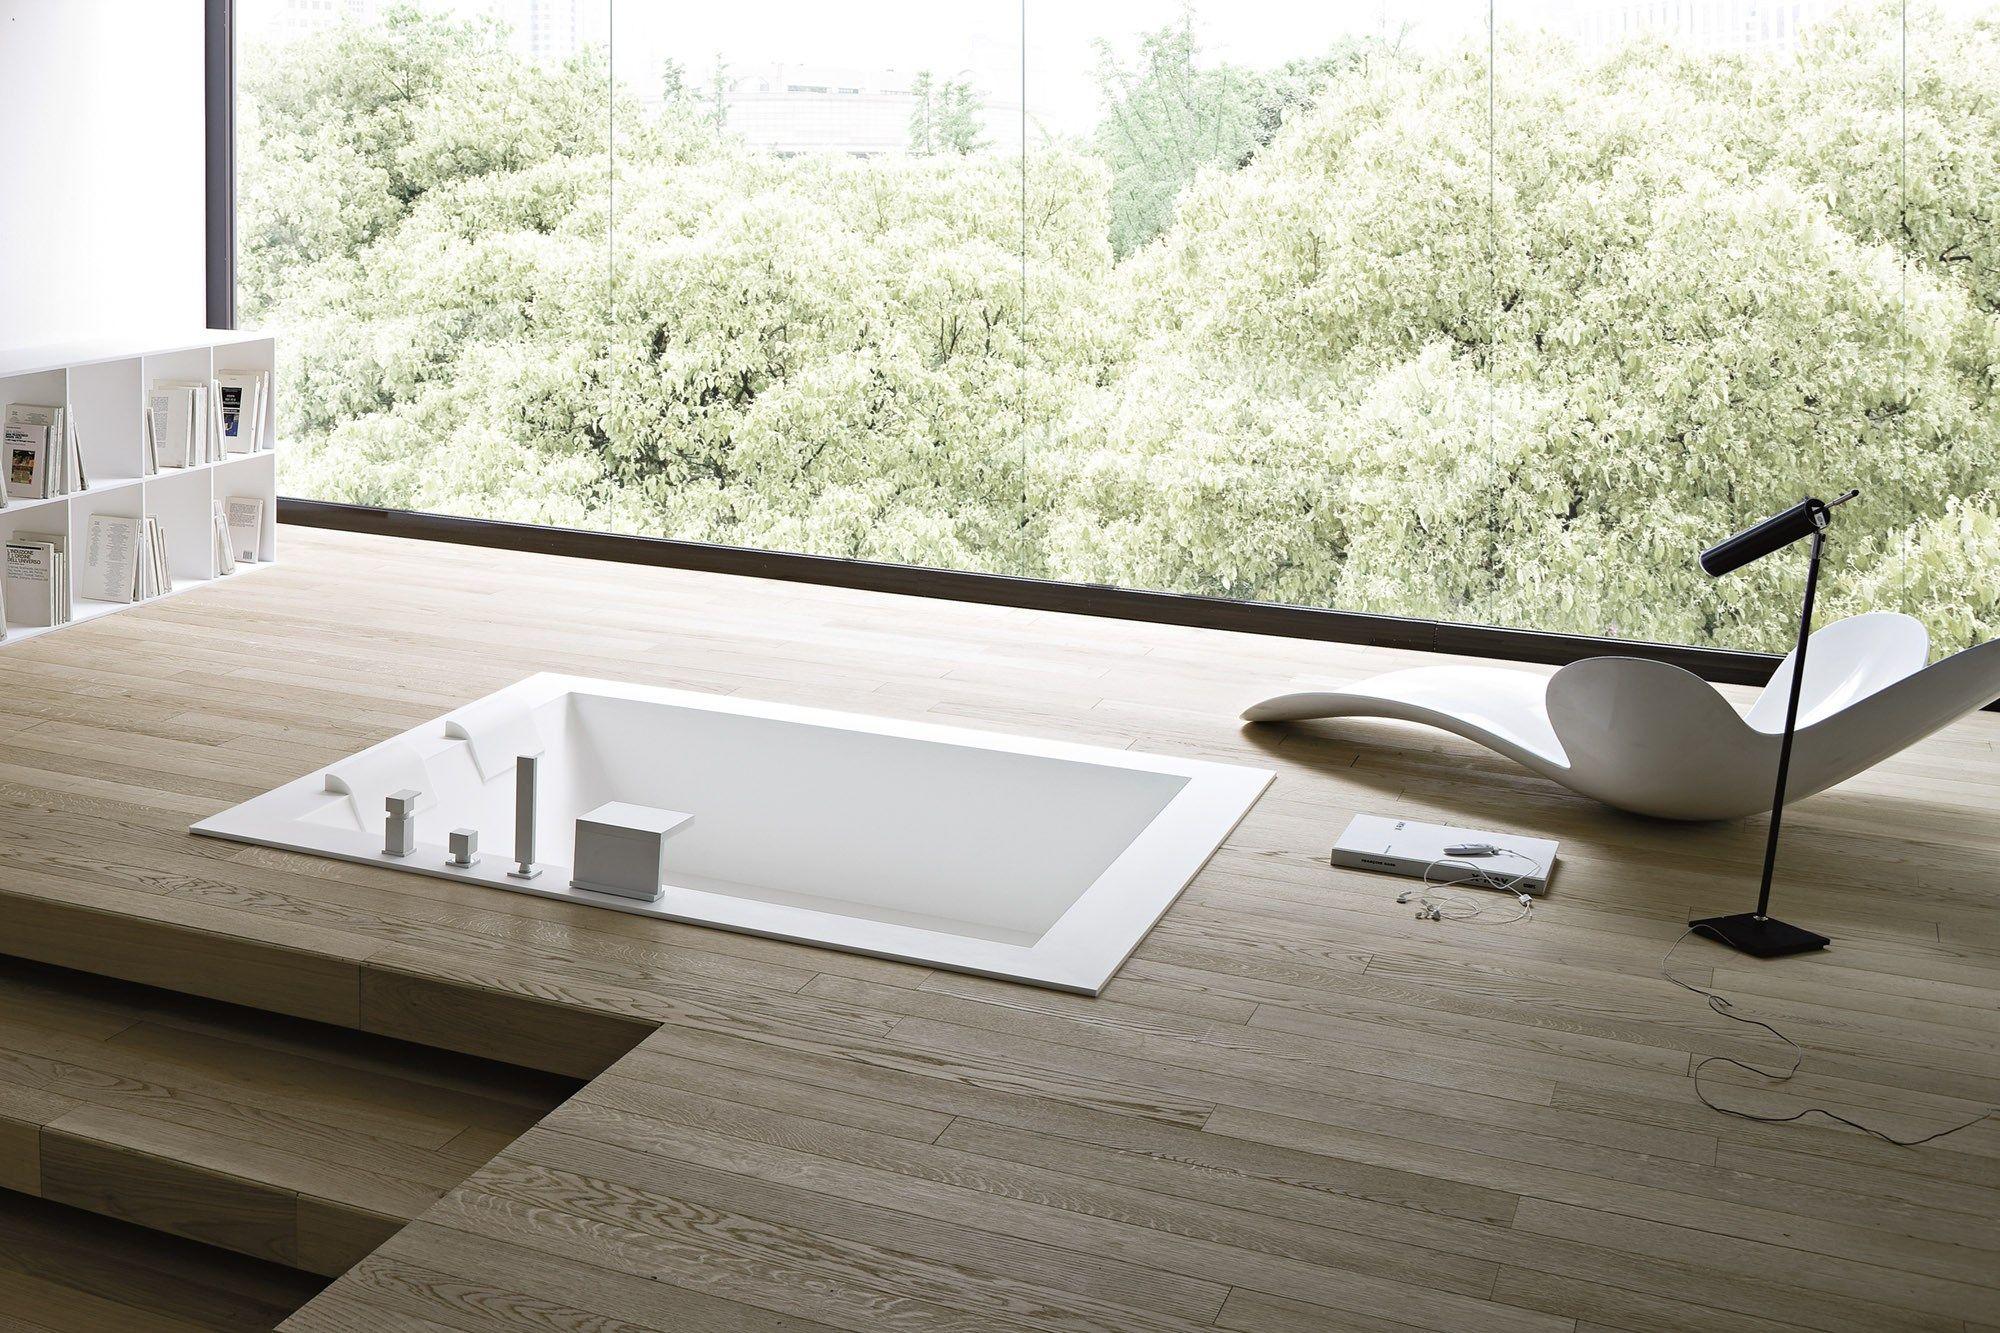 unico baignoire encastrable by rexa design design imago design. Black Bedroom Furniture Sets. Home Design Ideas